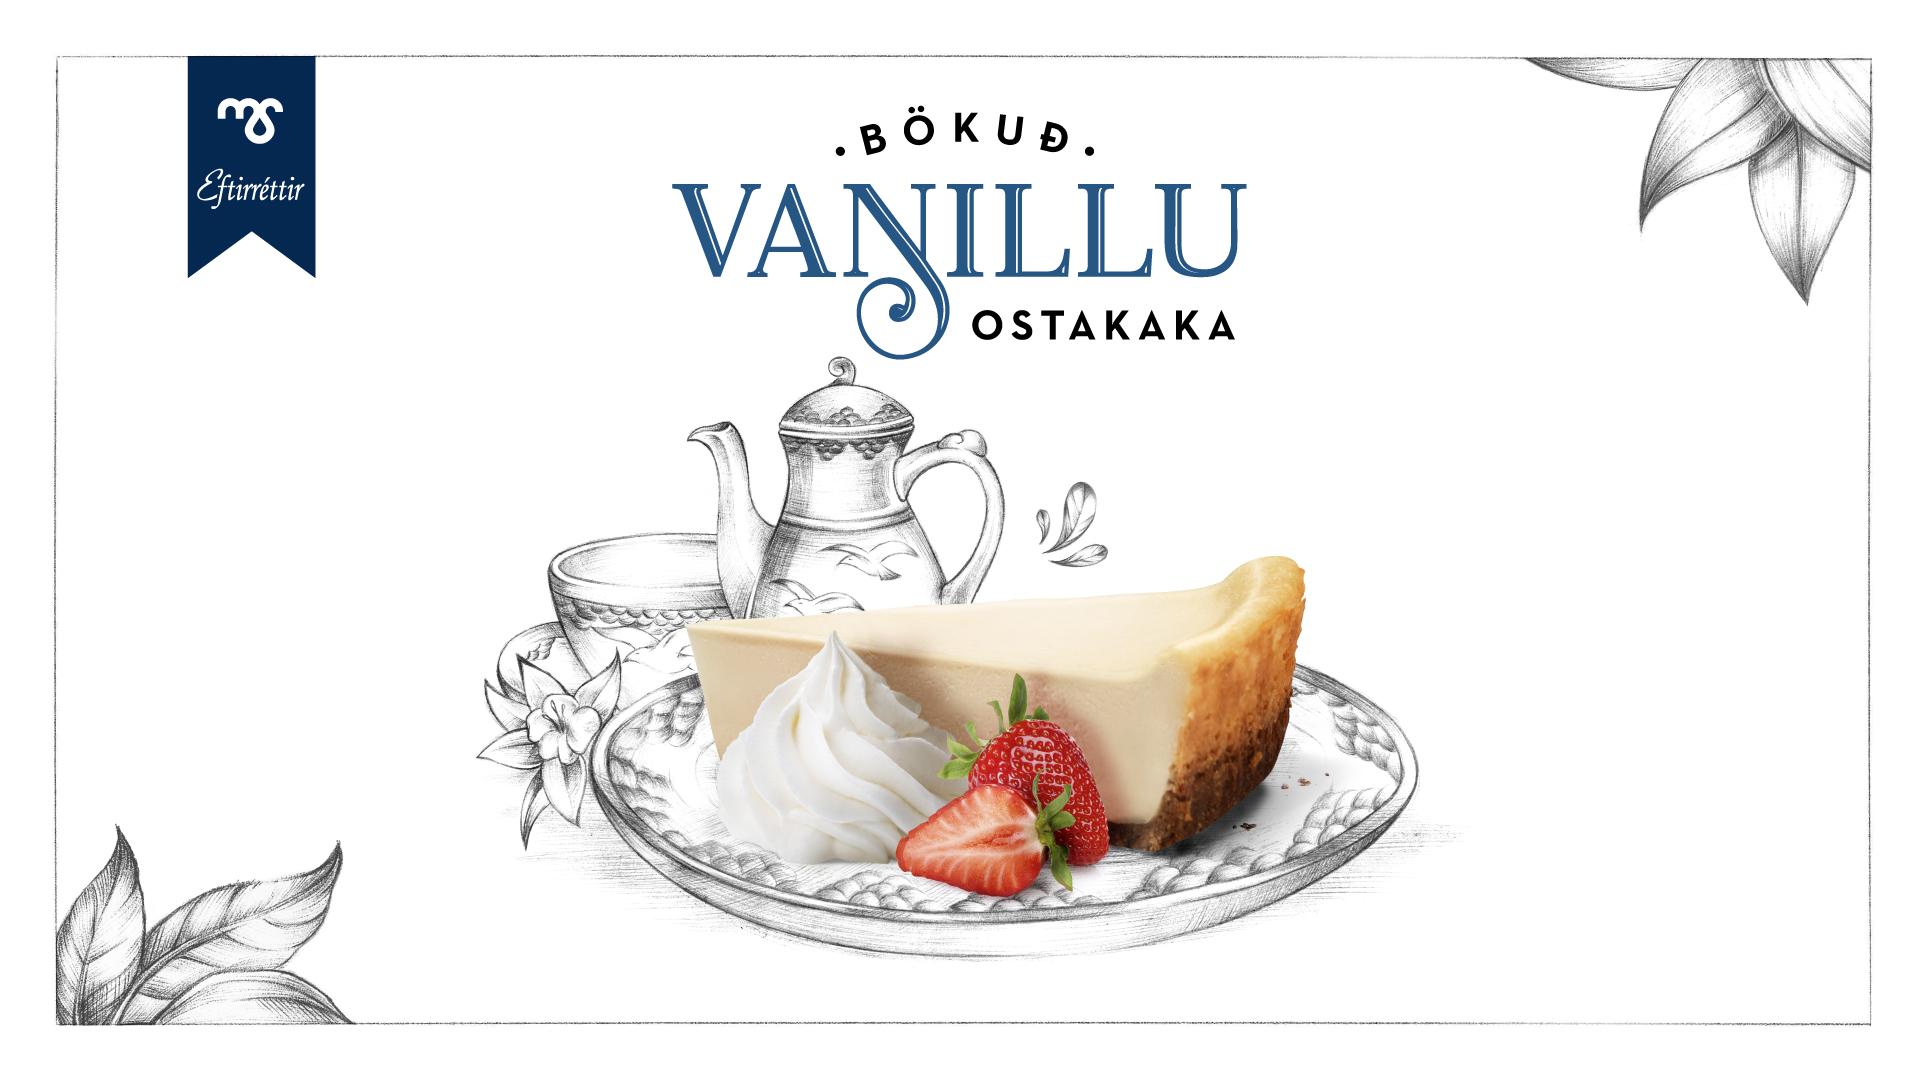 1920x1080_vanilluostakaka_cover